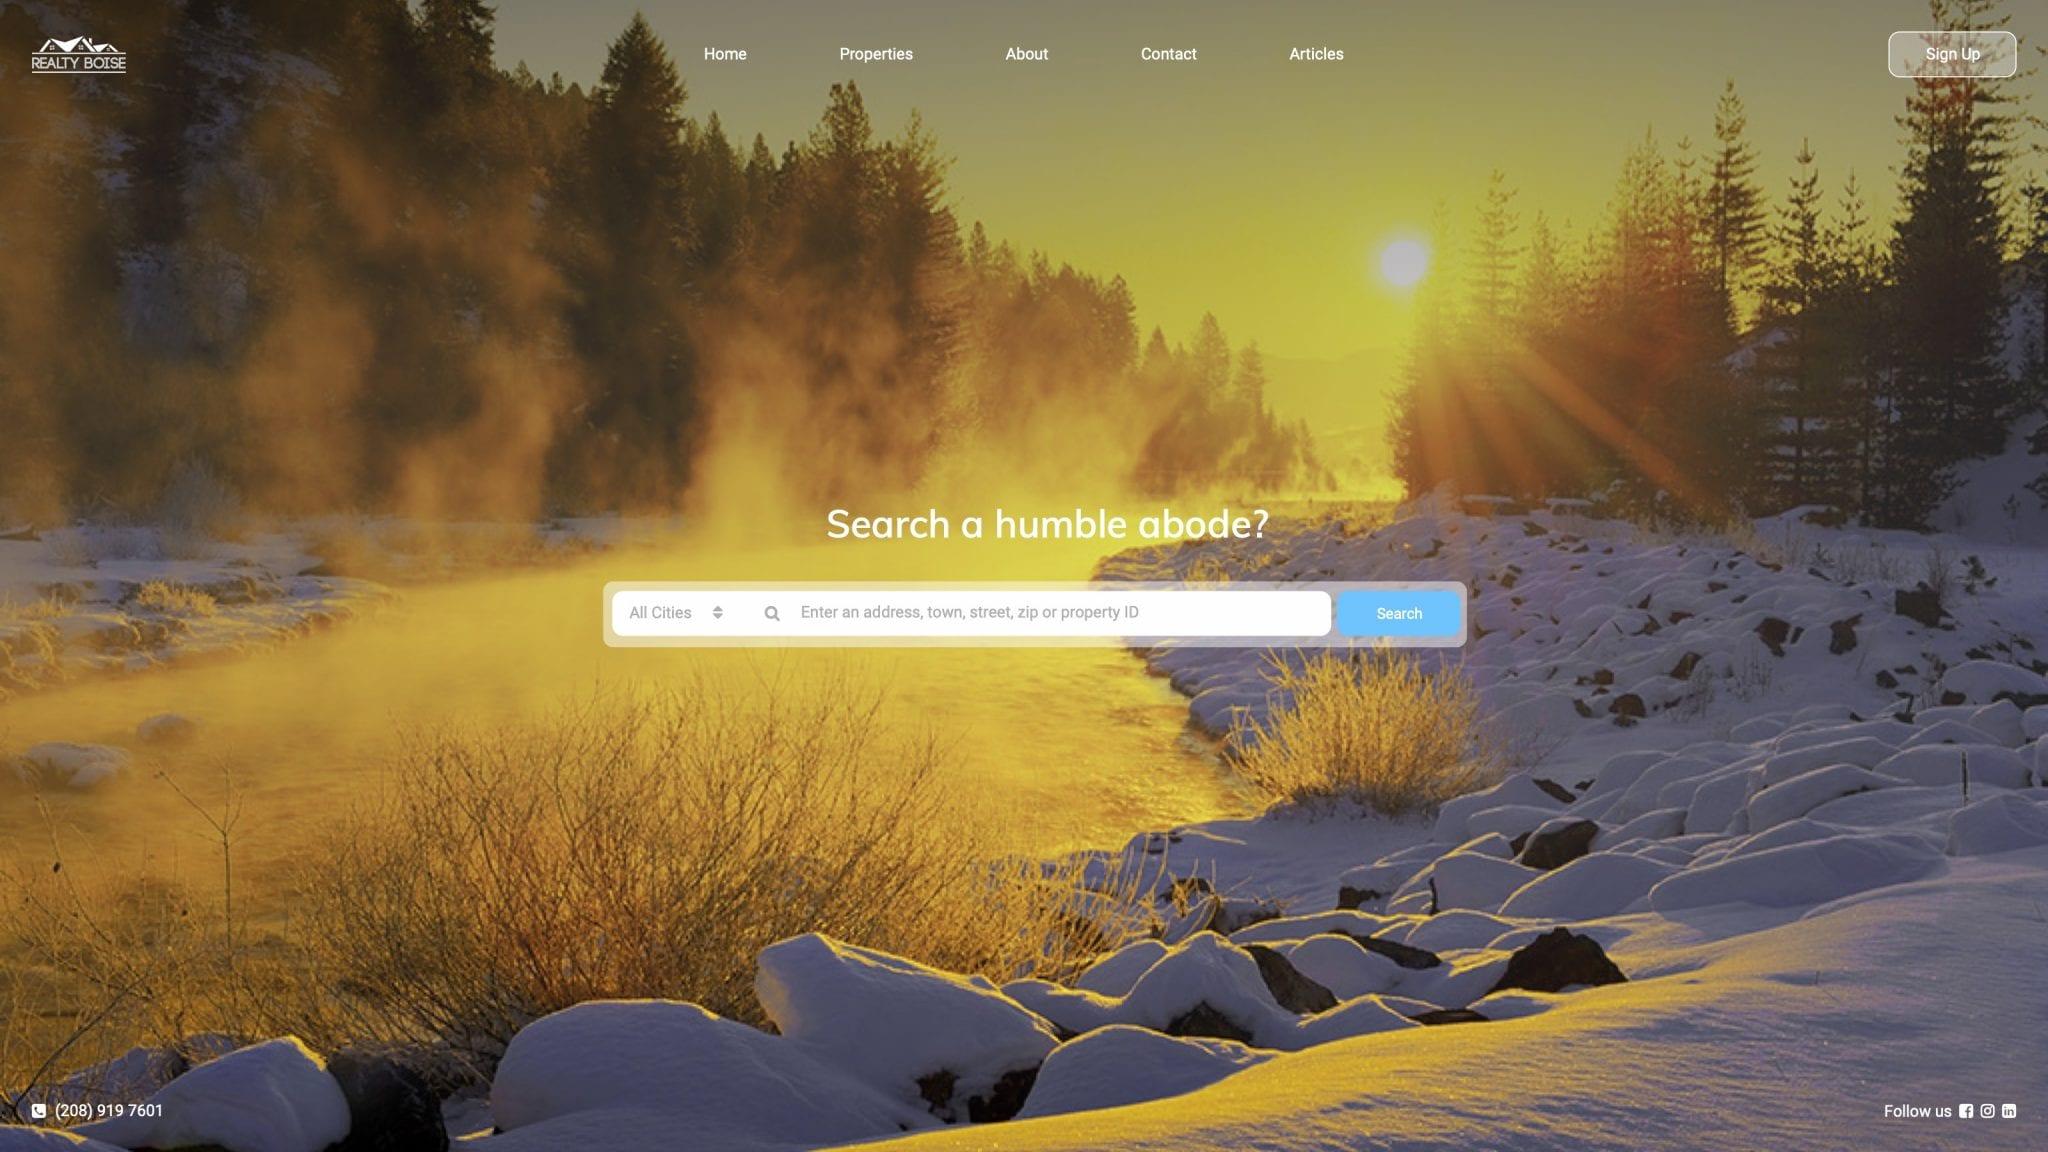 Realty Boise website concept